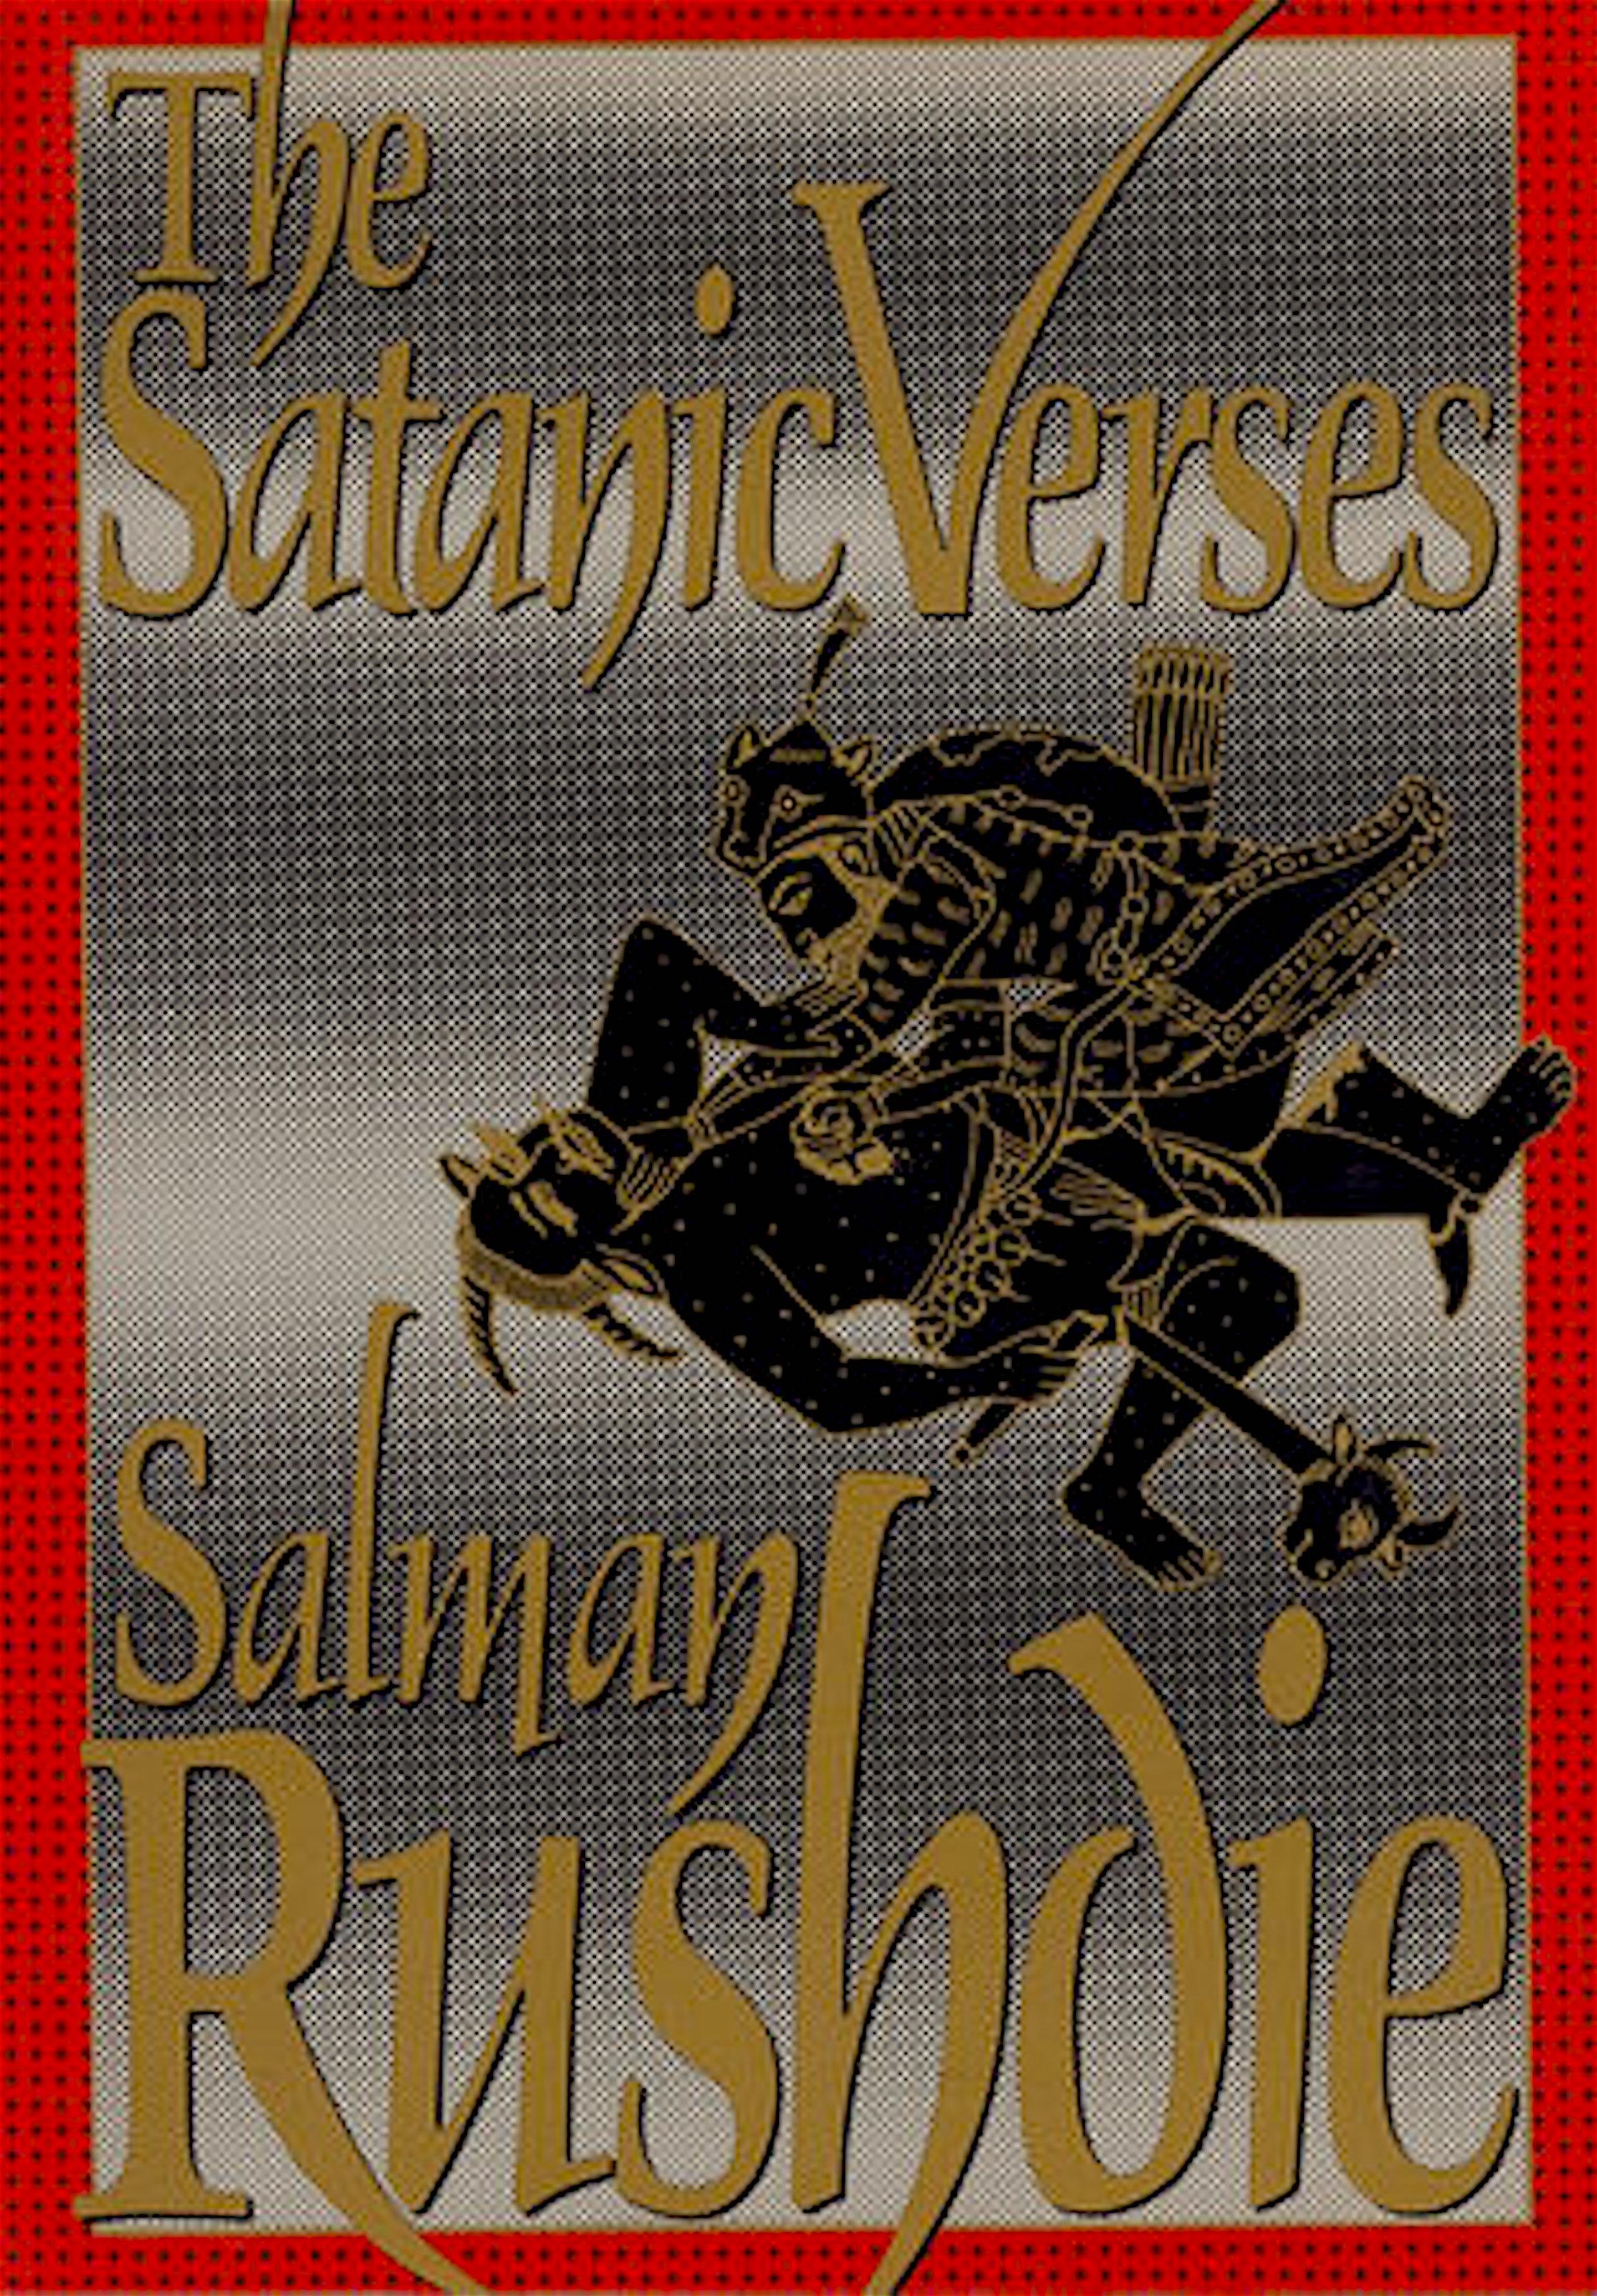 Salman Rushdie – The Satanic Verses (foto Penguin Random House)